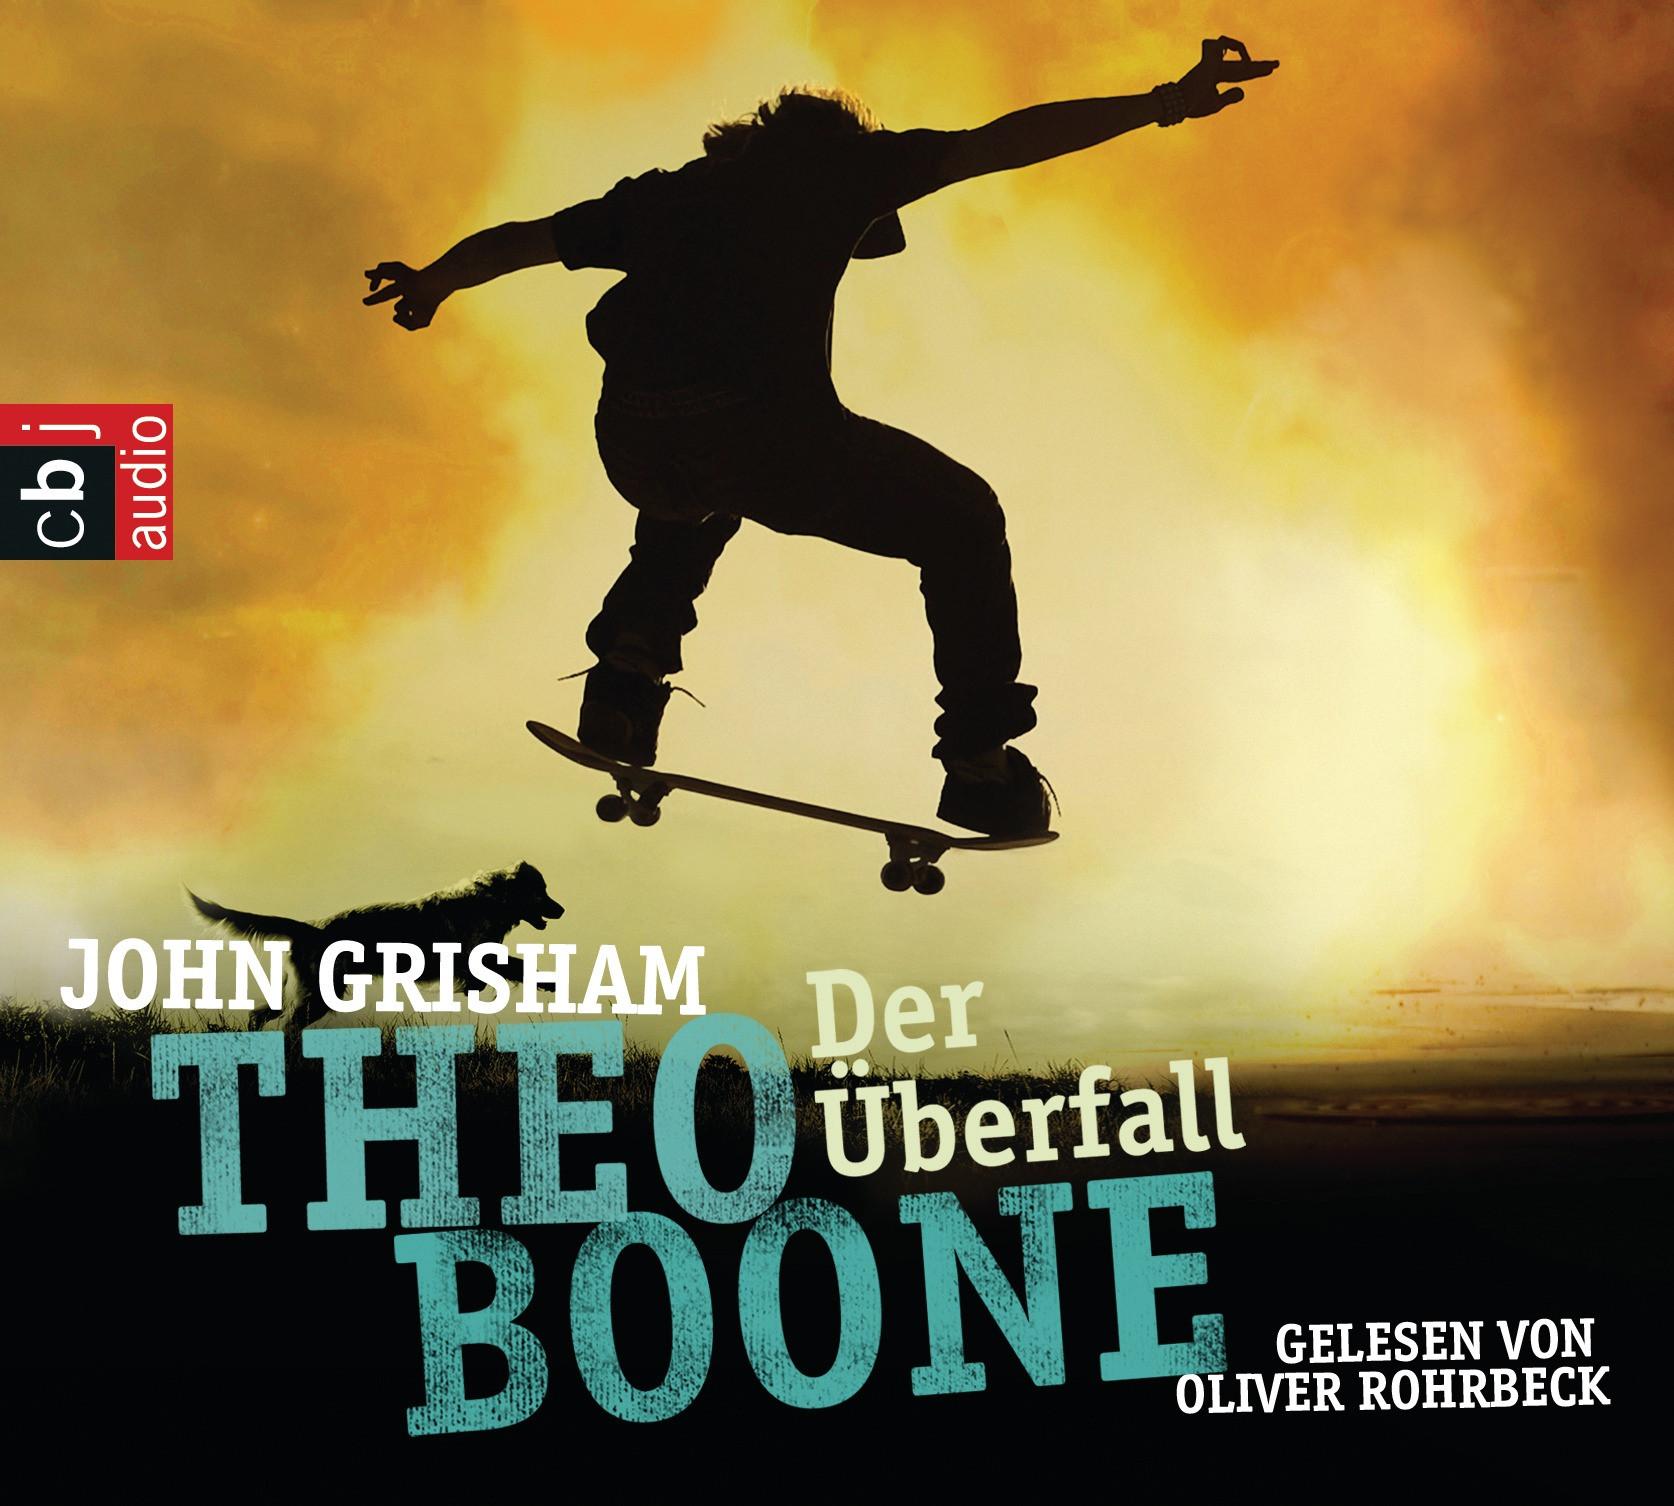 John Grisham - Theo Boone: Der Überfall (Band 4)